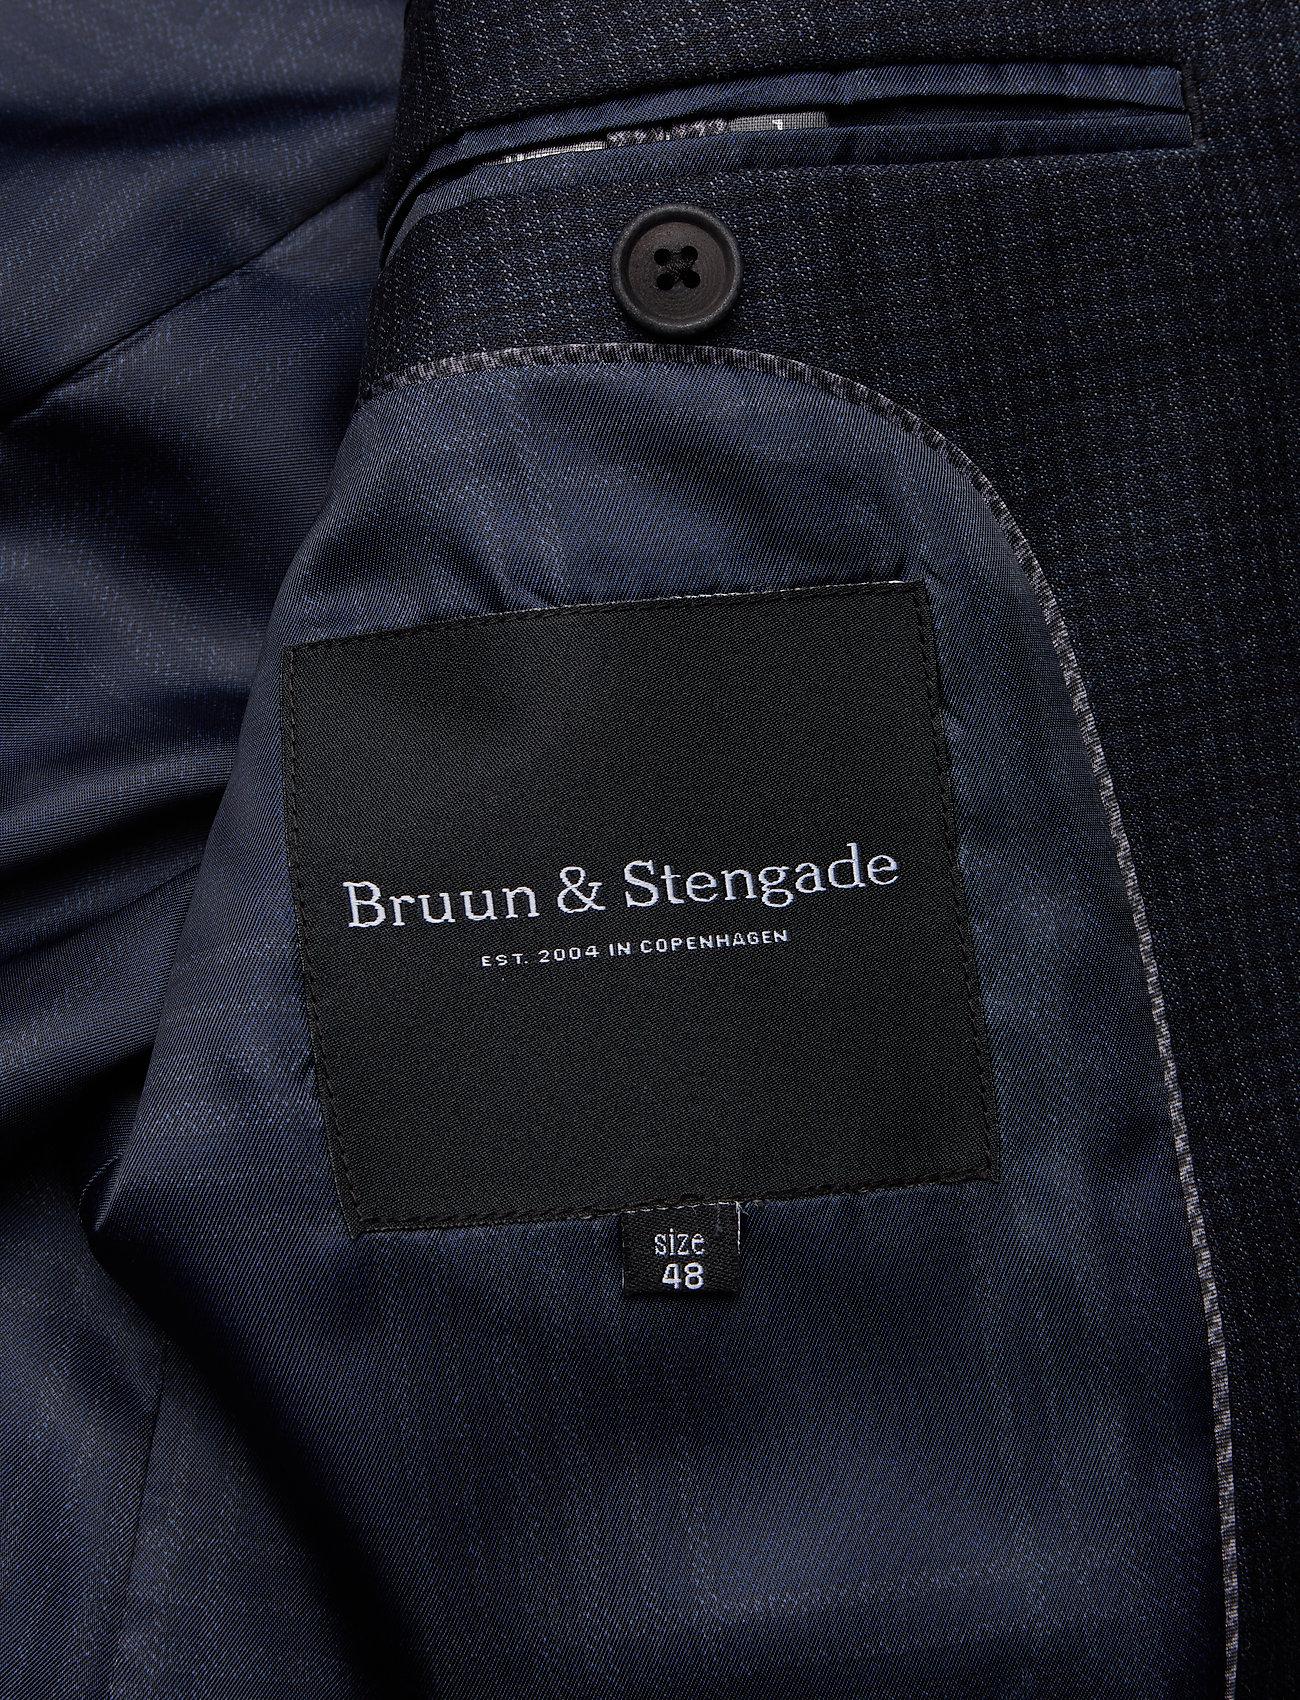 Bruun & Stengade Bs Nashville - Kostymer & Kavajer Navy